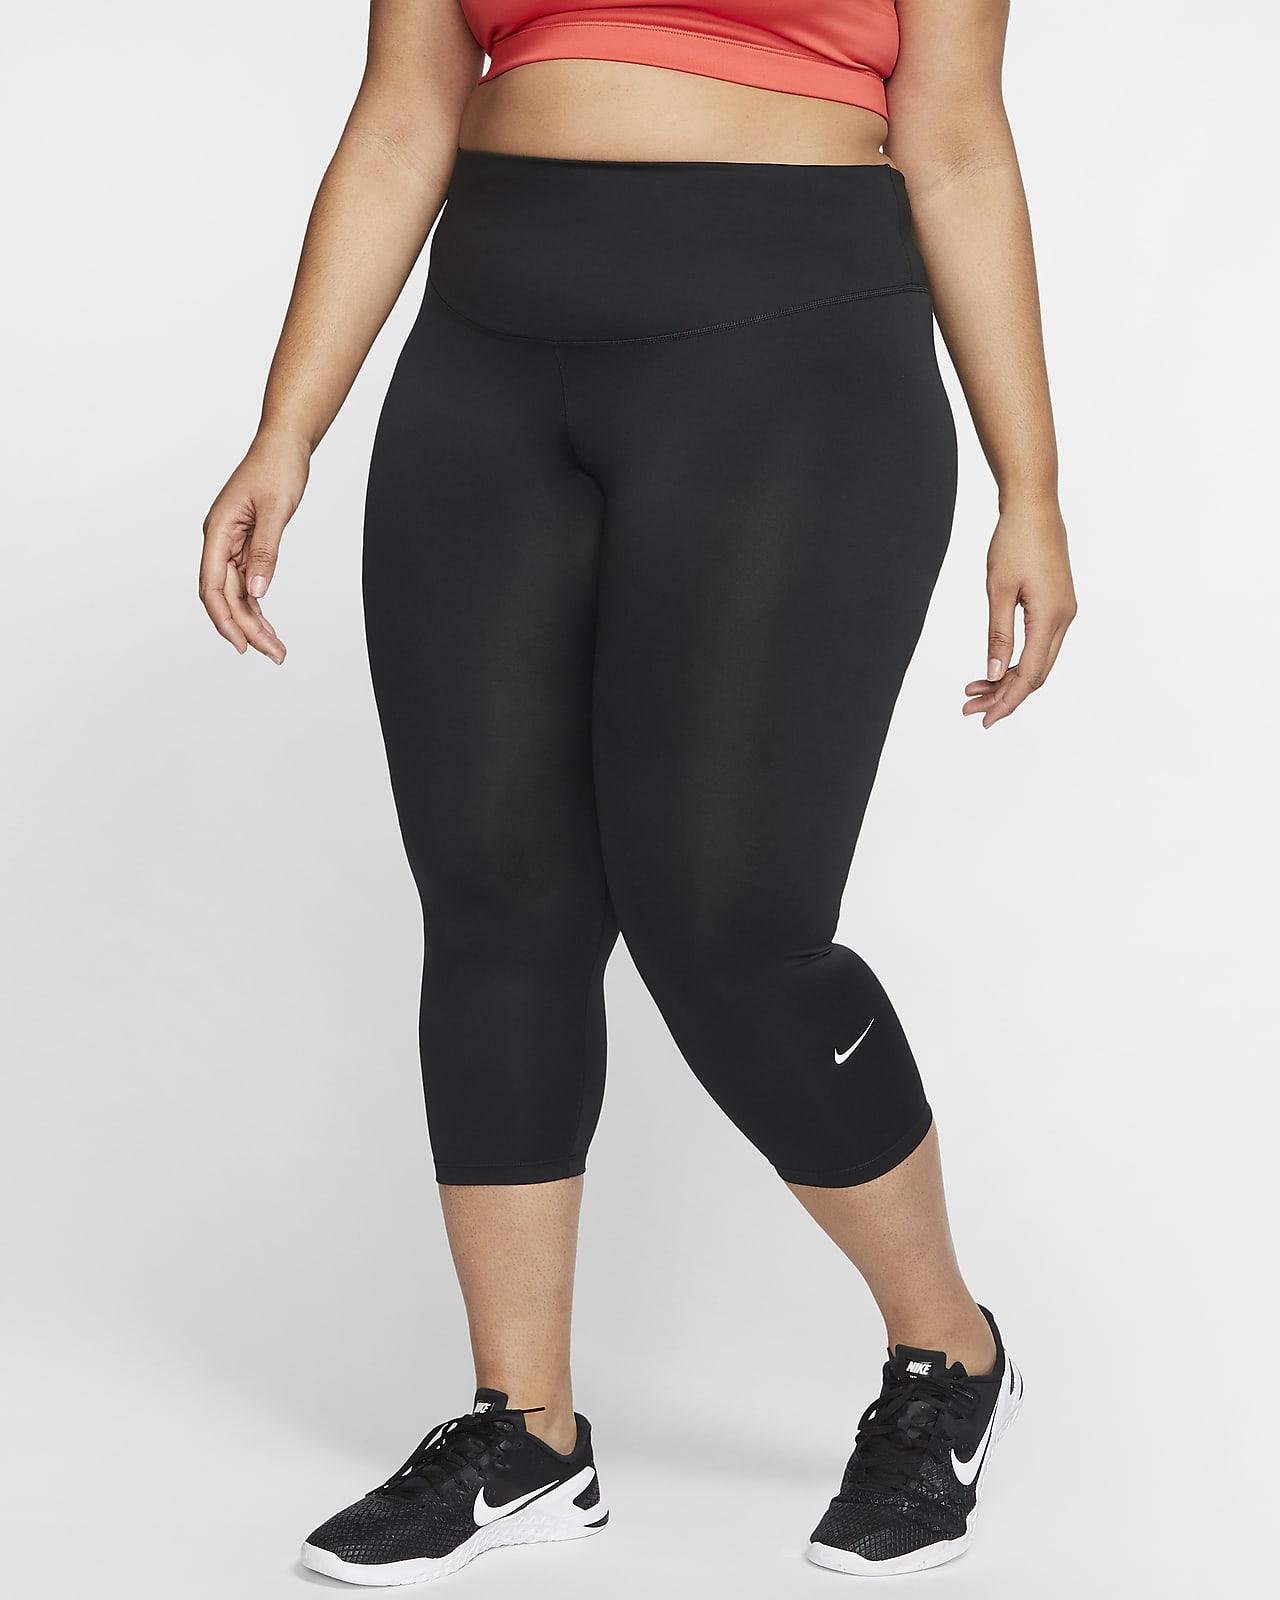 Hazme Exclusivo cortador  Nike One Damen-Tights mit Crop-Design (große Größe). Nike DE